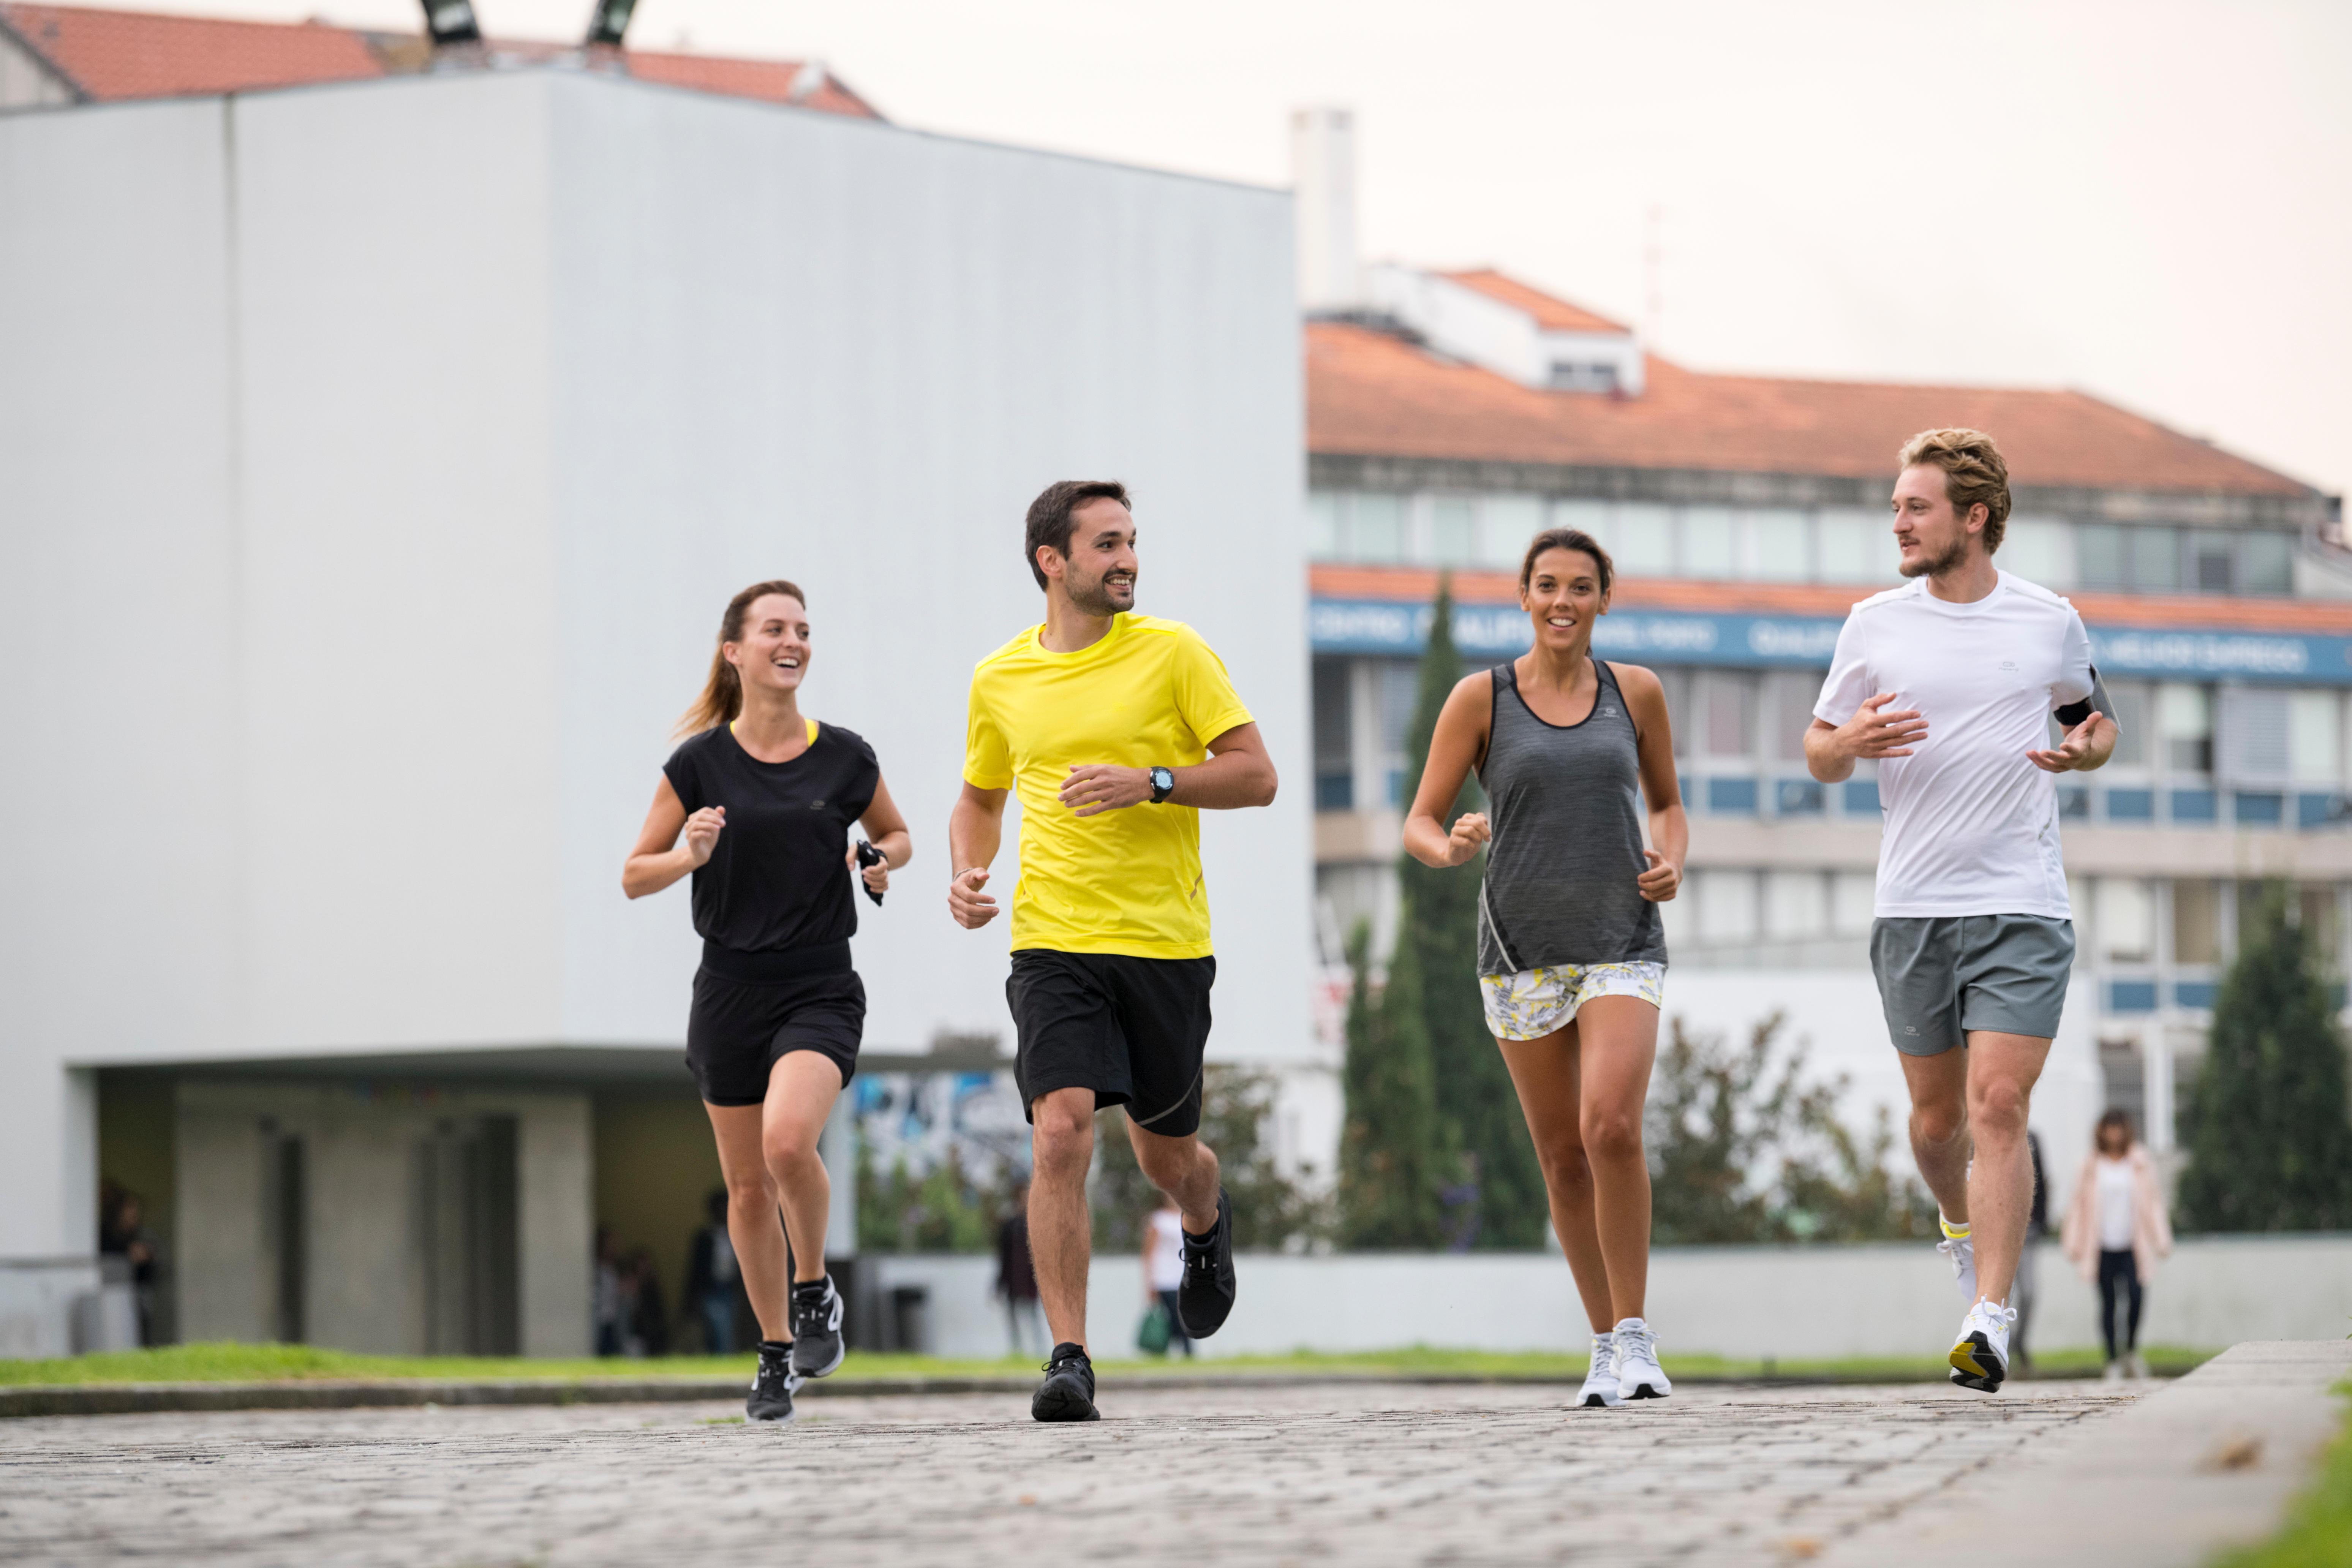 Why Do Men Run Faster Than Women